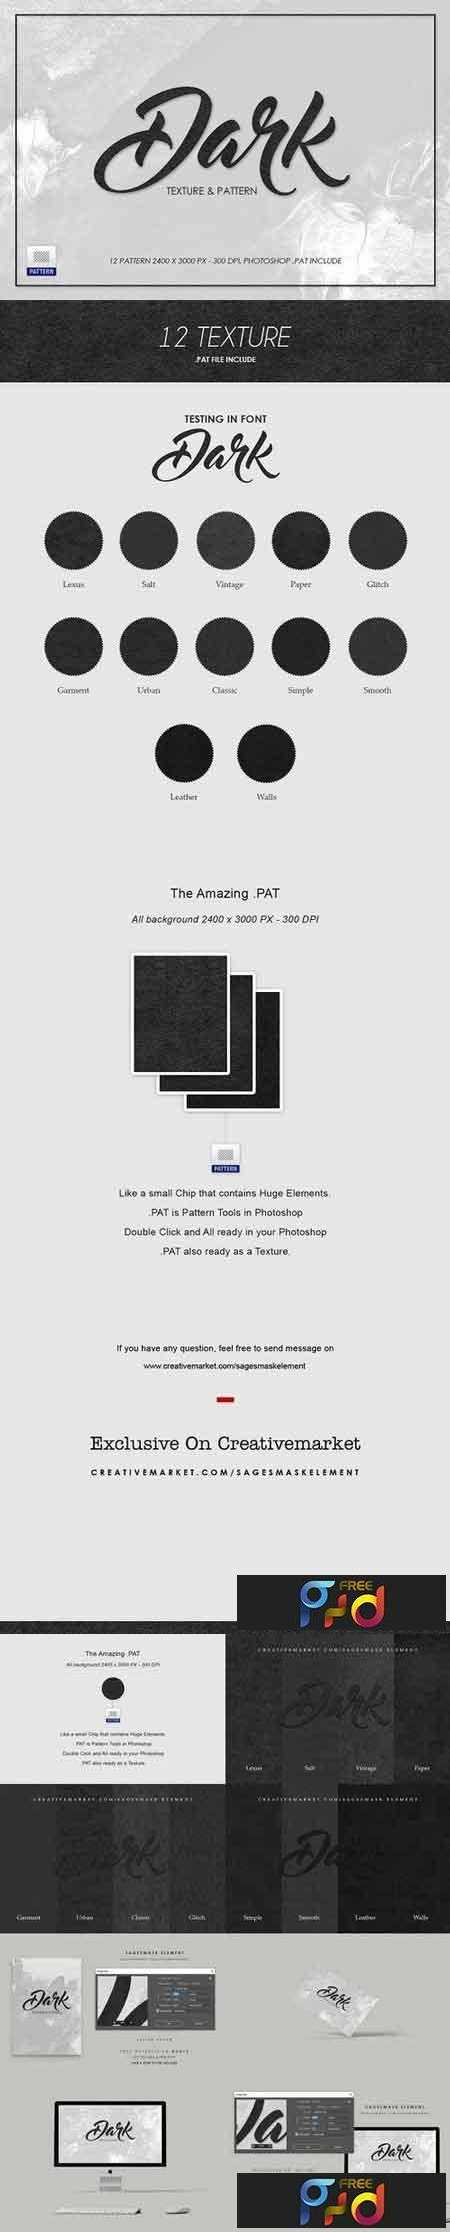 FreePsdVn.com_1703298_PHOTOSHOP_black_dark_texture_708625